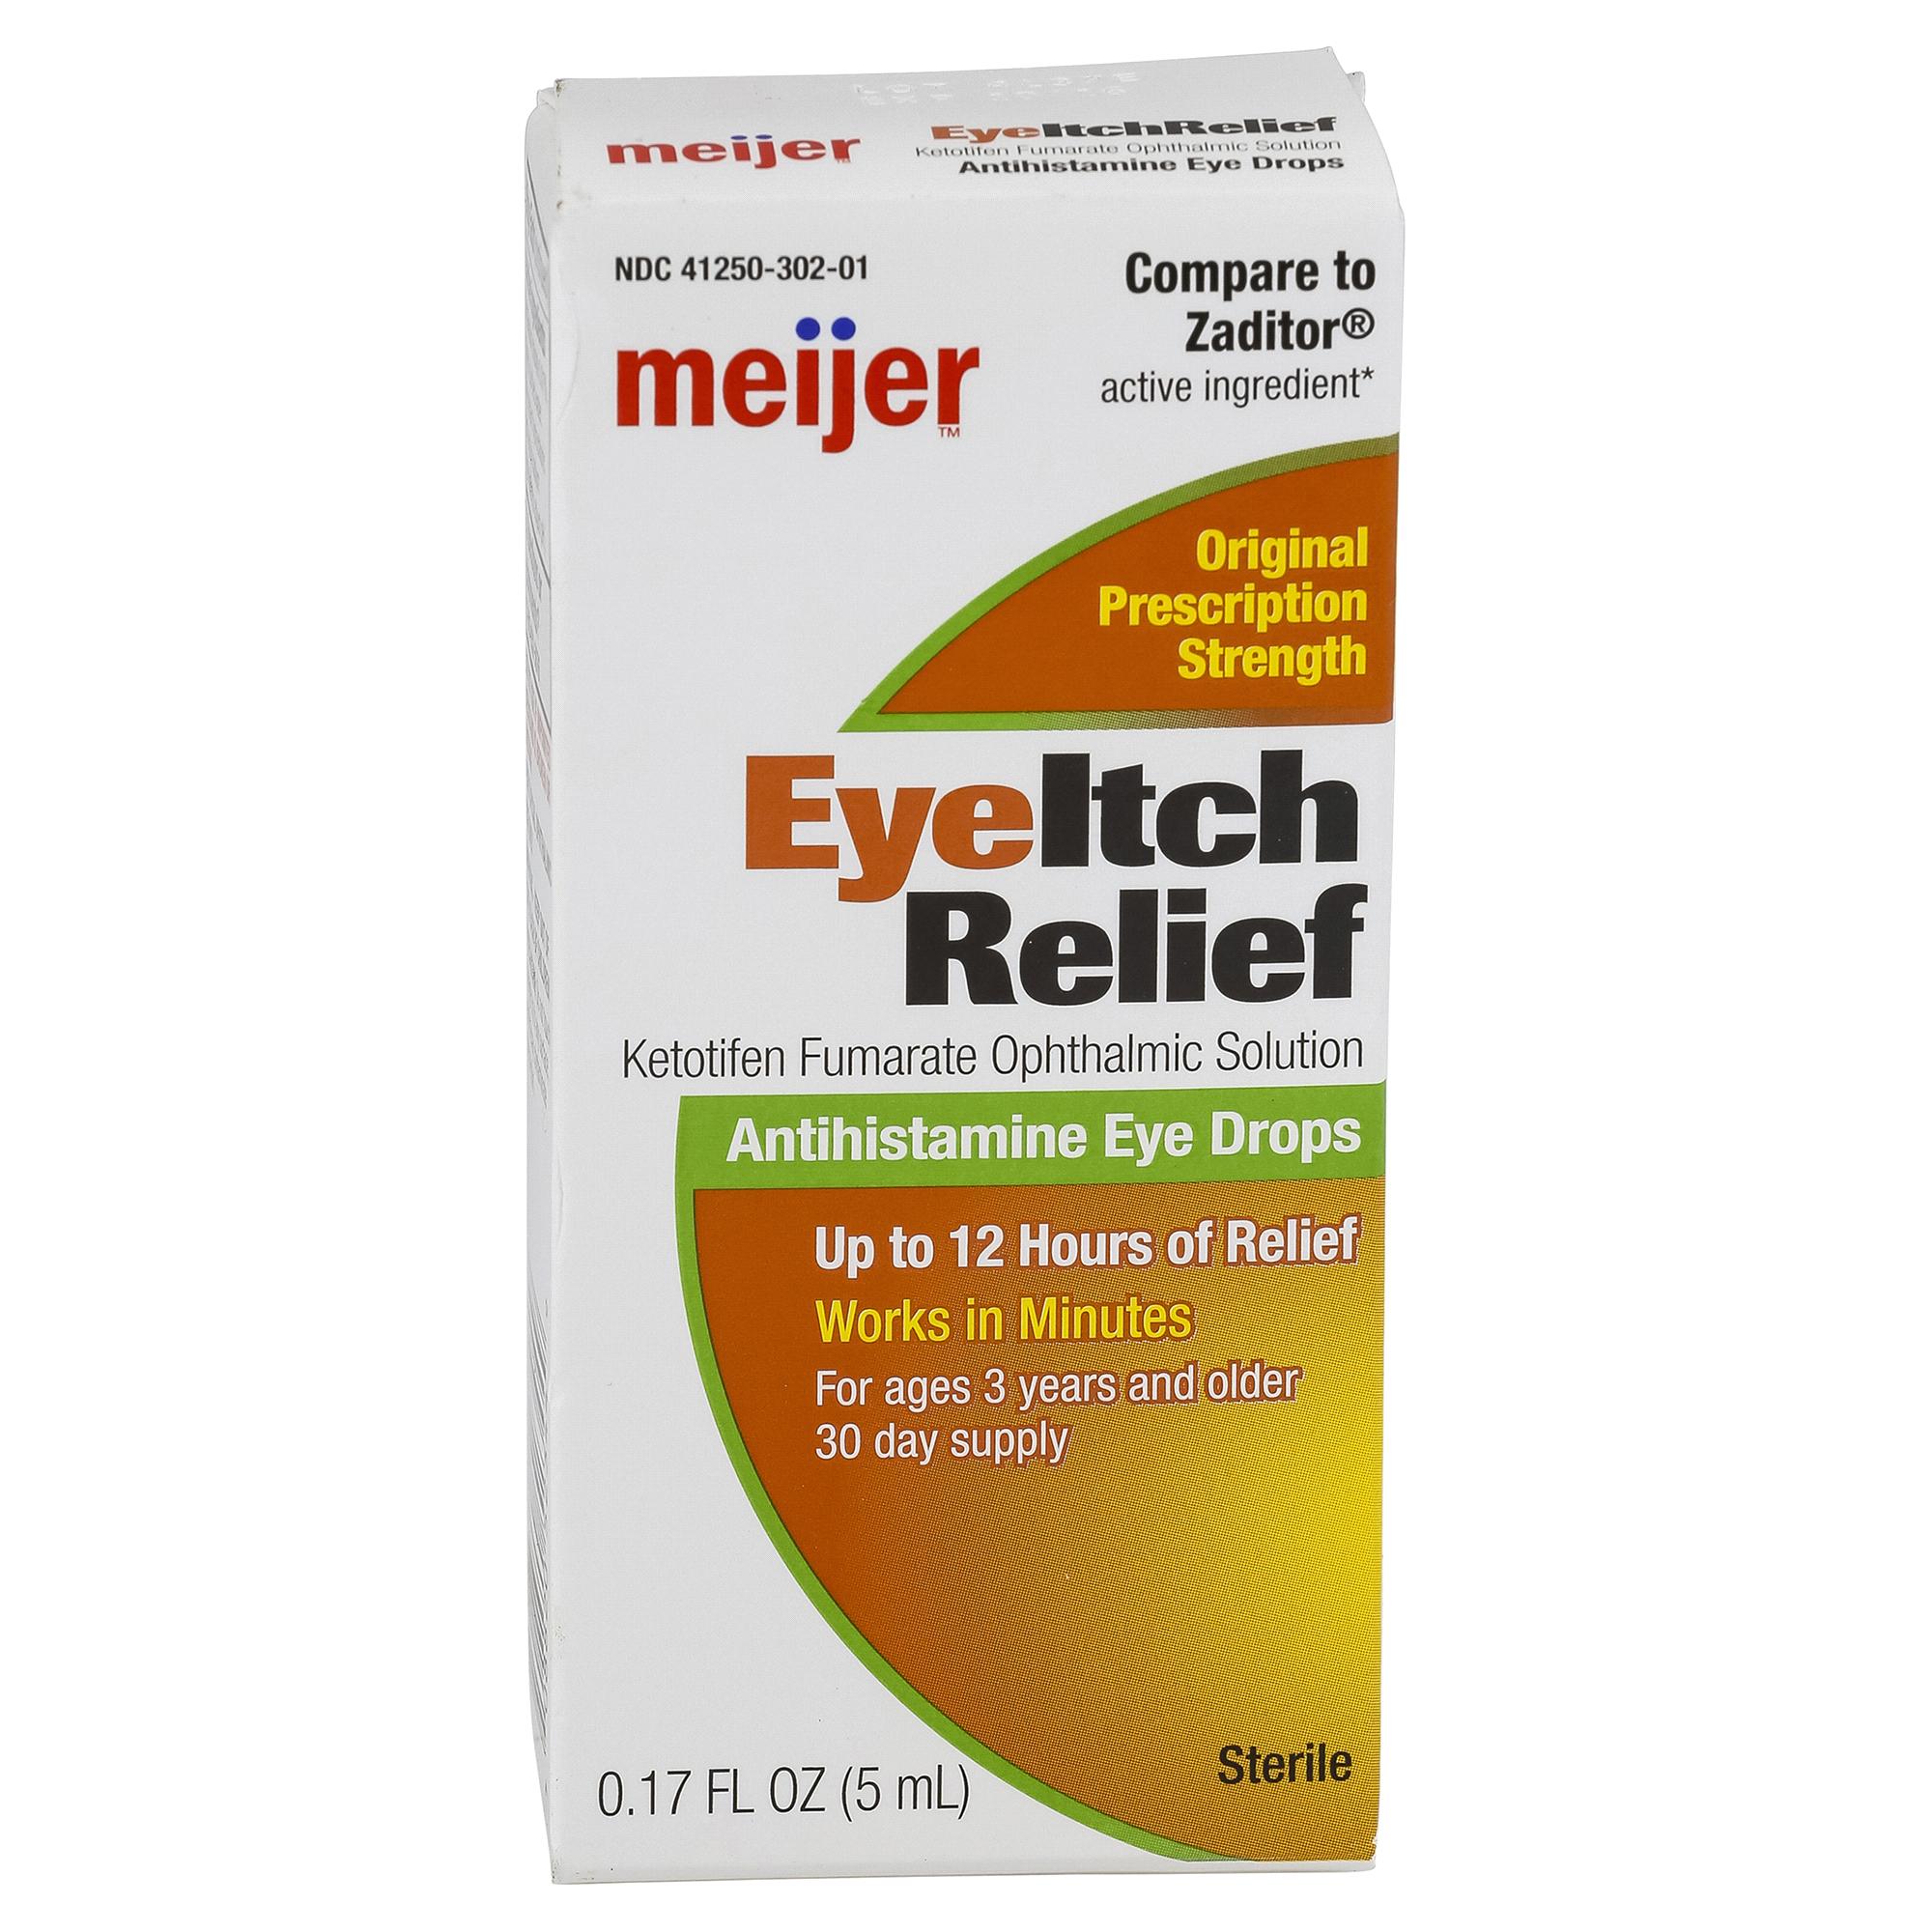 Meijer Eye Itch Relief Antihistamine Eye Drops 0.17 oz   Meijer.com